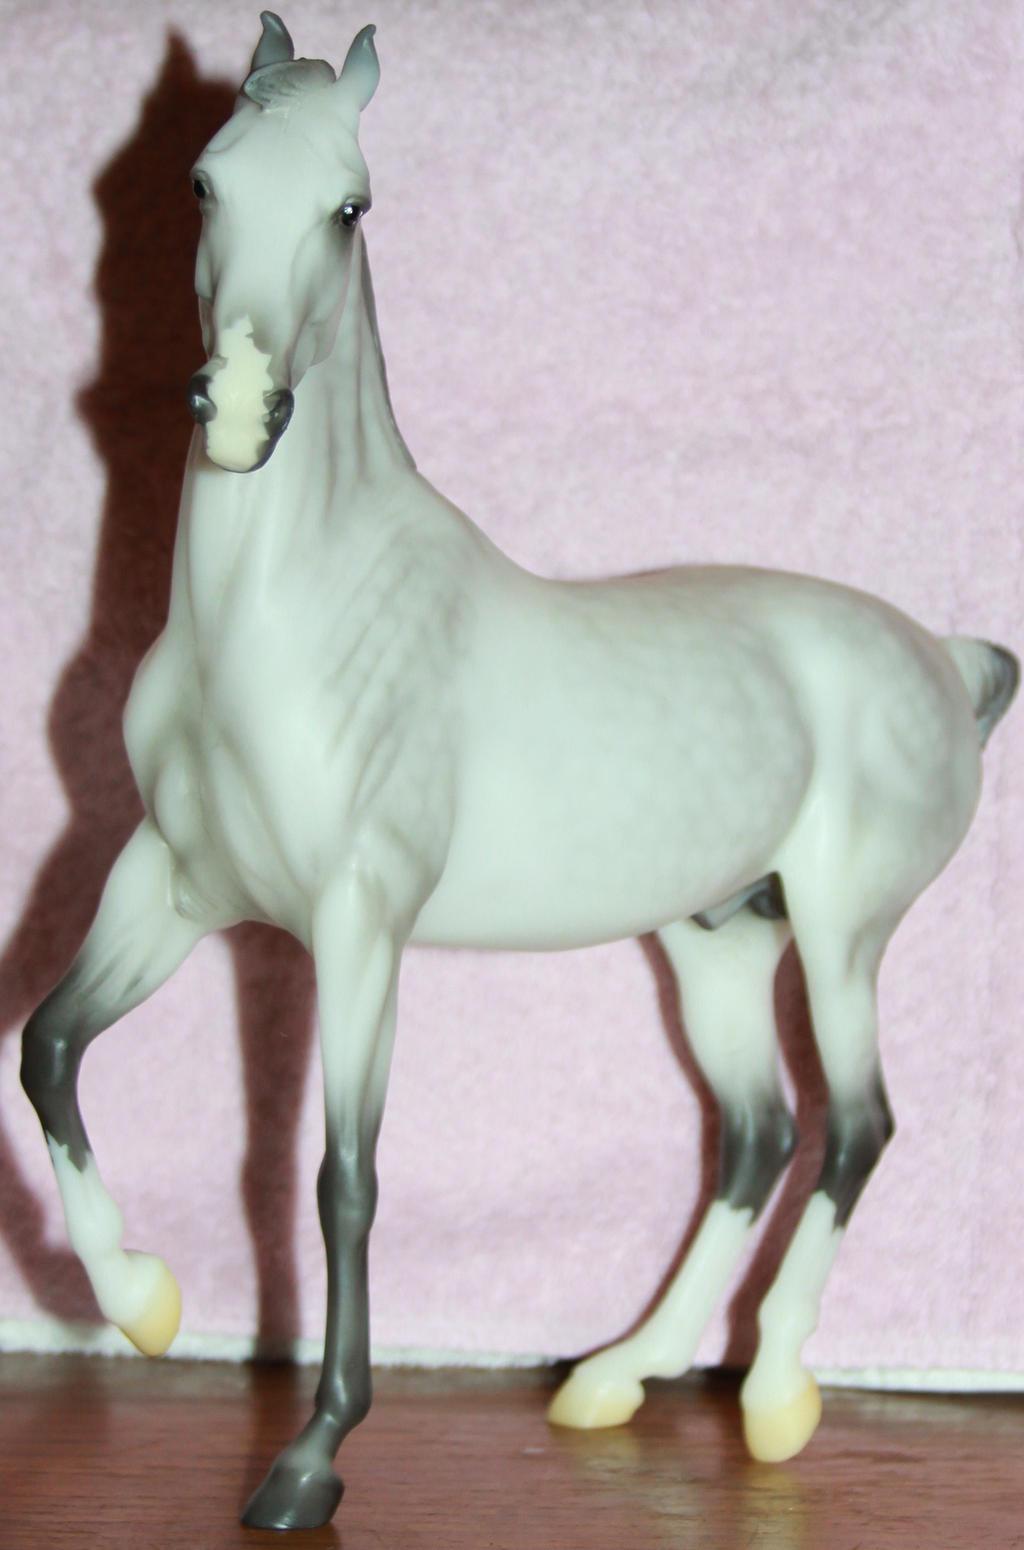 Breyer - Rajah 3 of 5 Stock~ Marwari Horse by Lovely-DreamCatcher